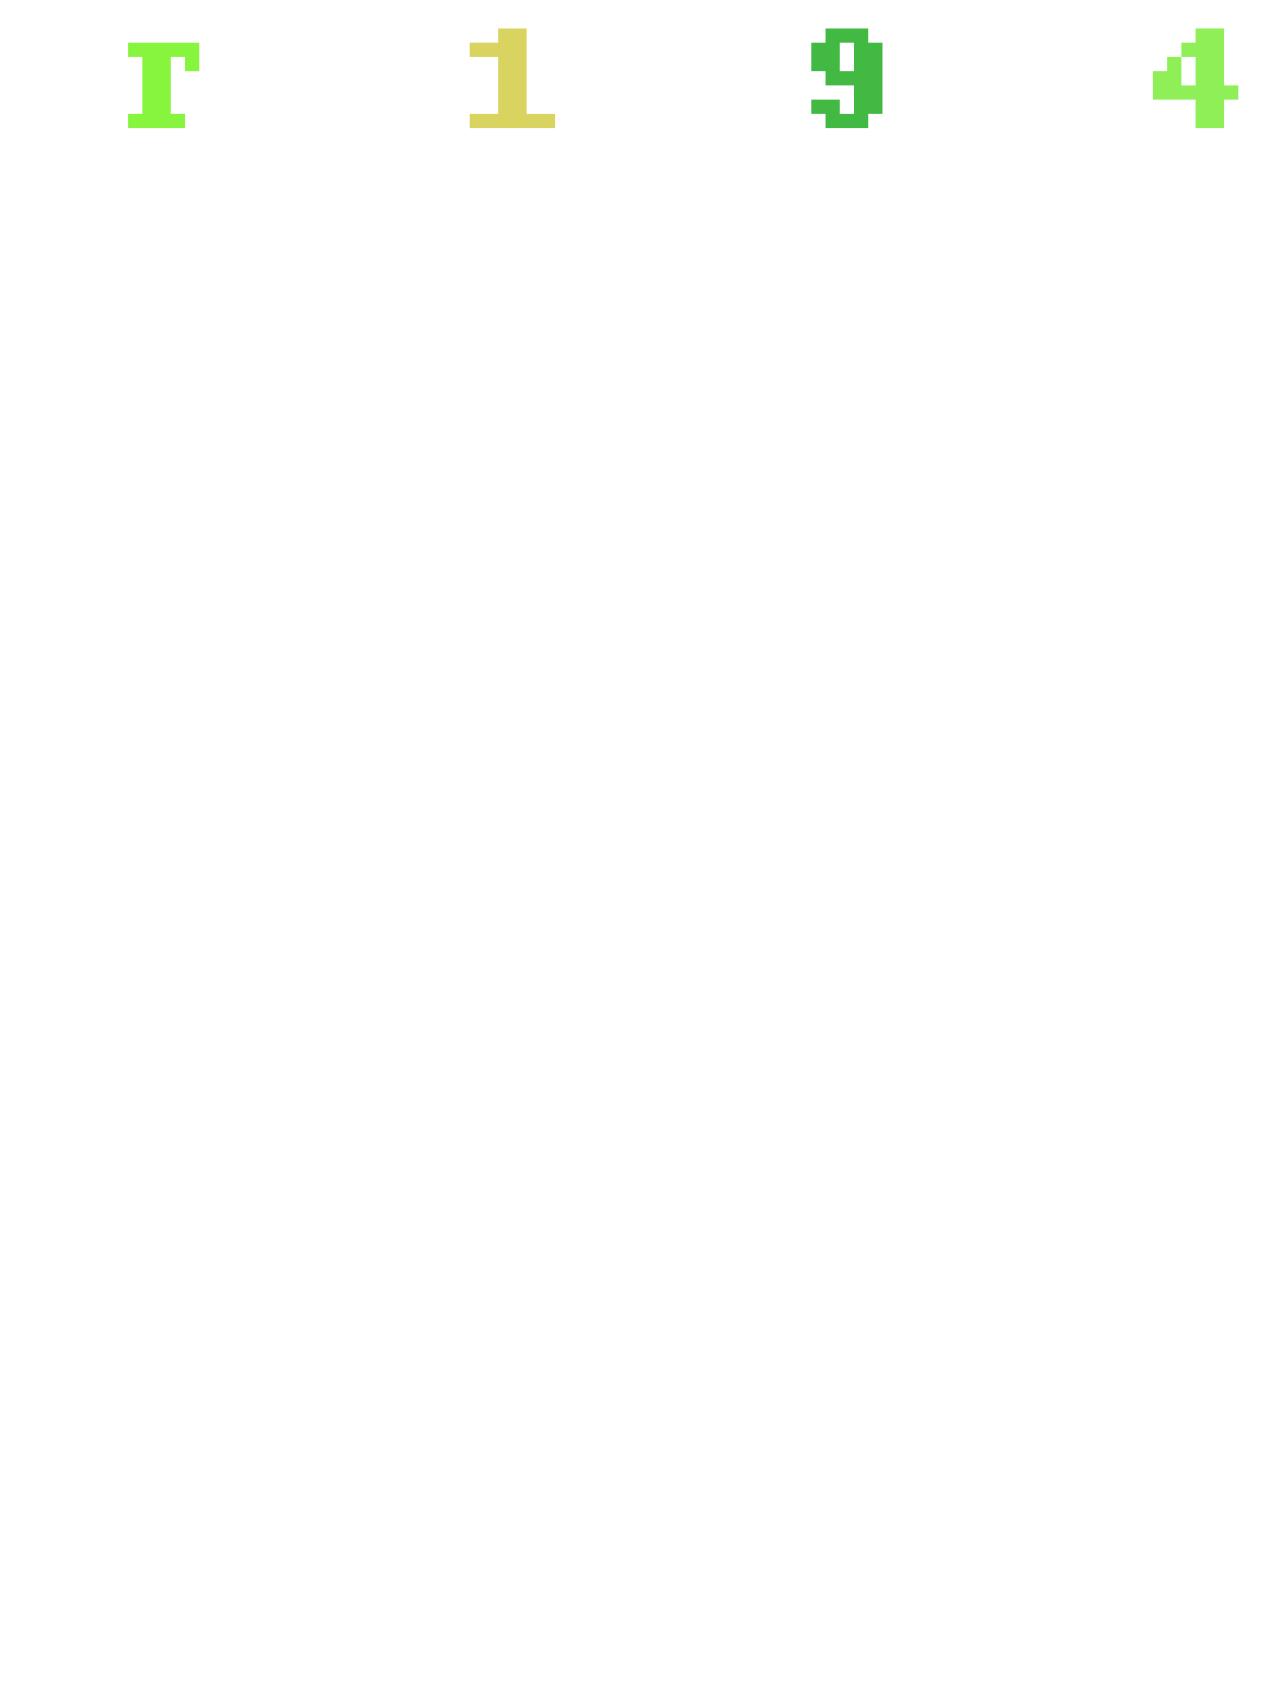 Strada sterrata, Tasmania.